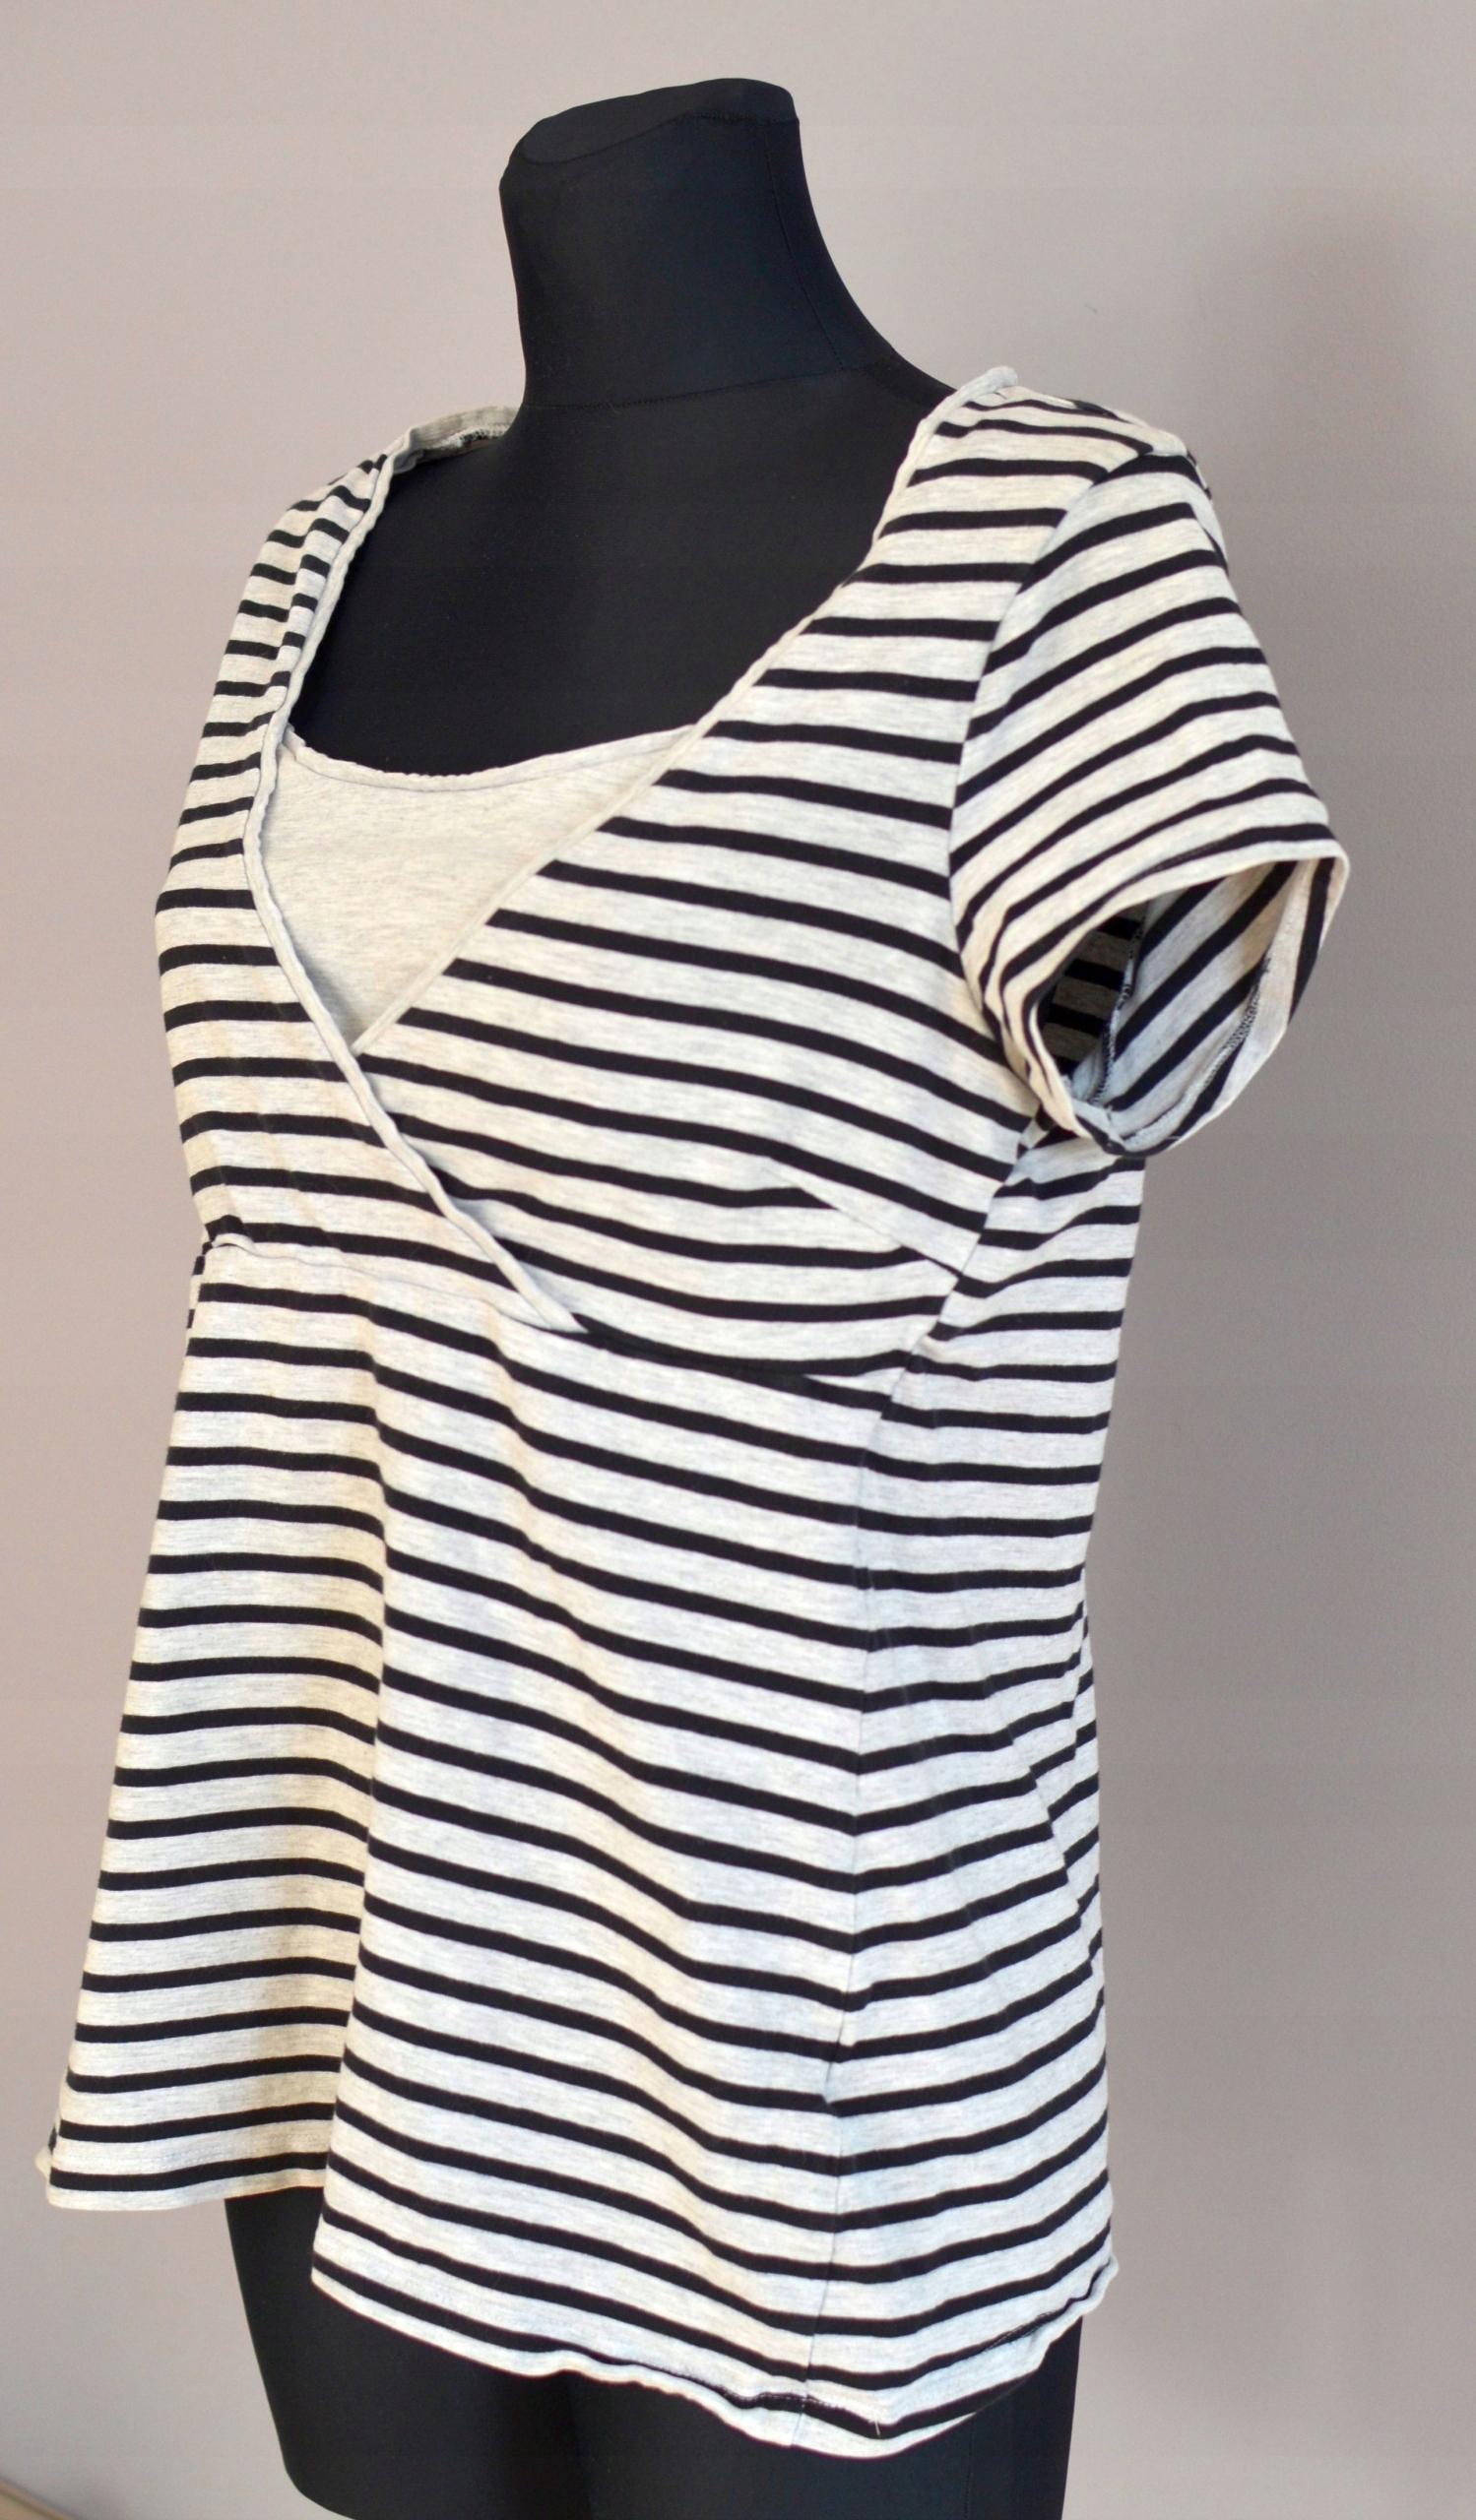 d1ad0f3eeee934 H&M mama tshirt bluzka ciążowa i do karmienia - 7441023307 ...